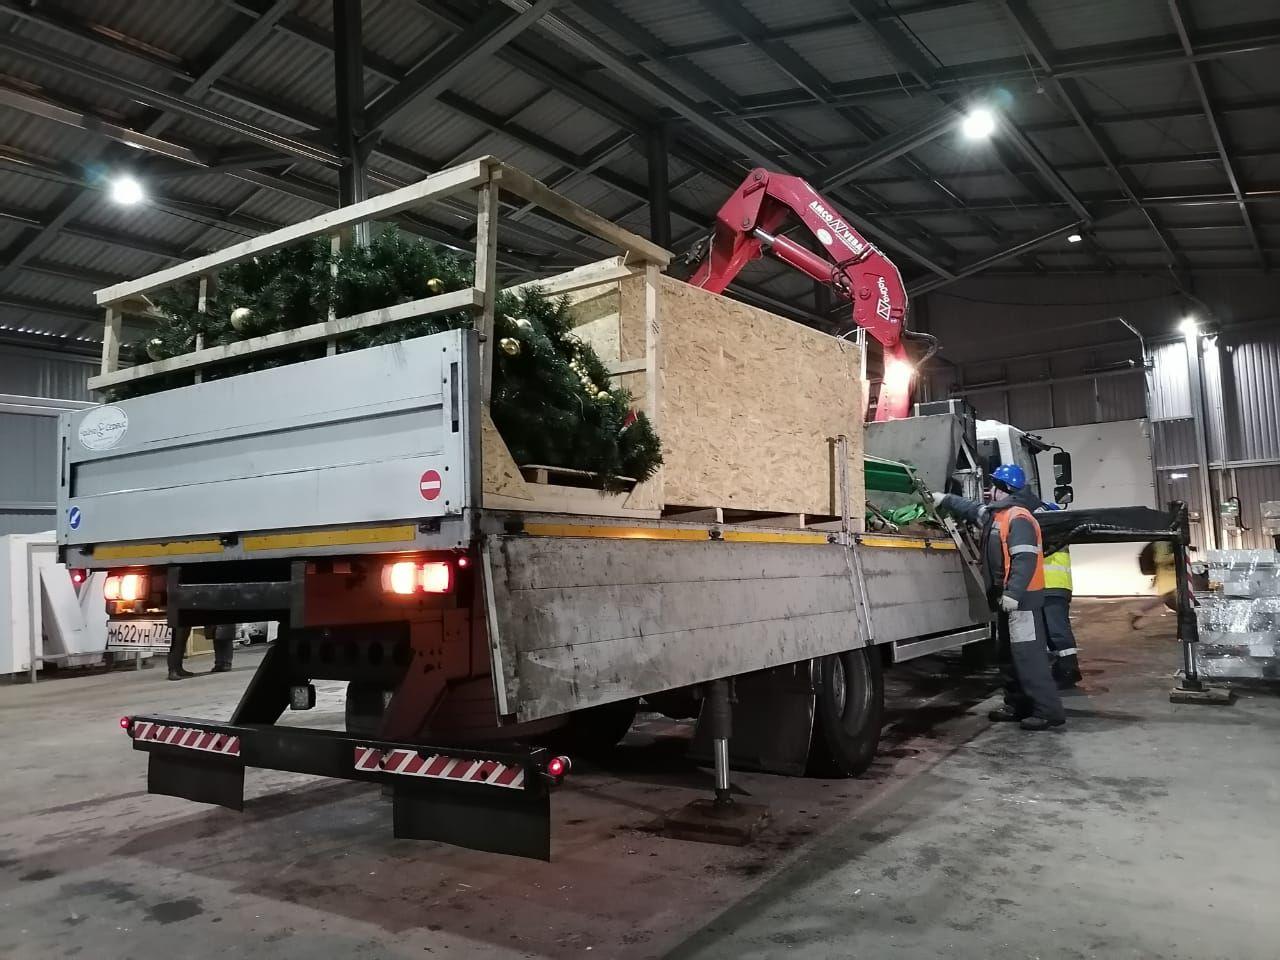 машина, склад, новогодняя ель, демонтаж, погрузка